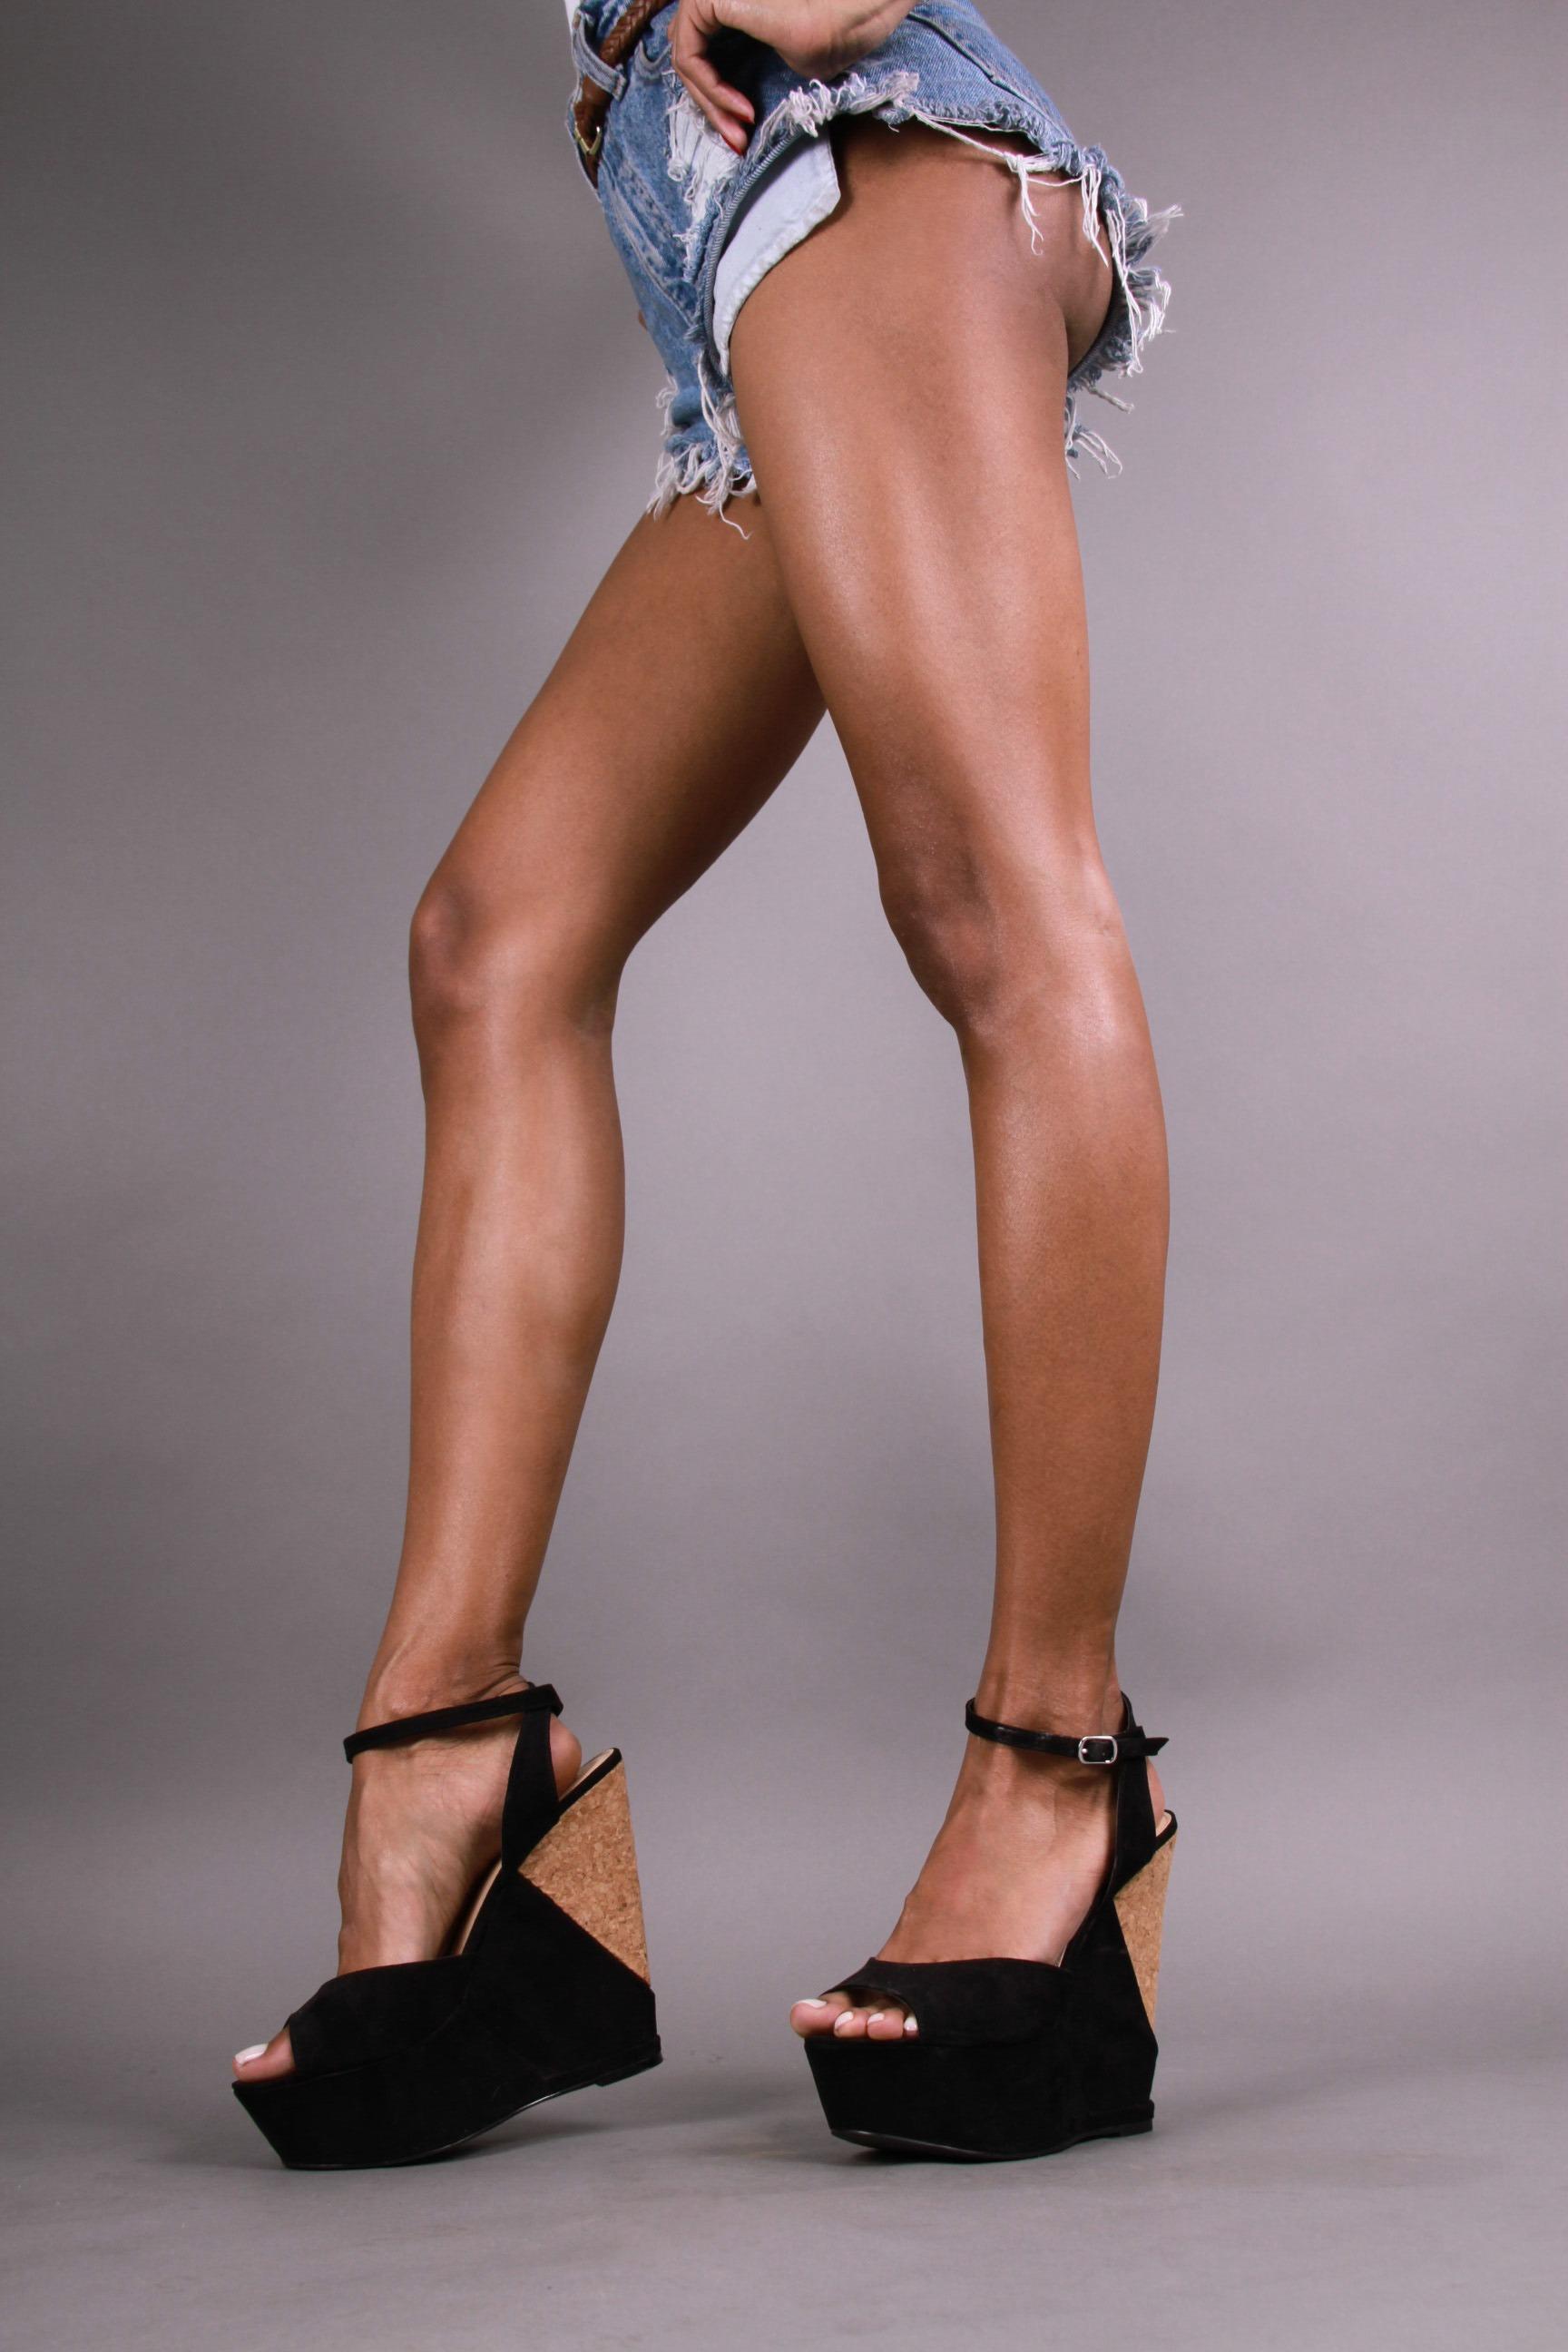 Elizabeth Grullon_Legs2